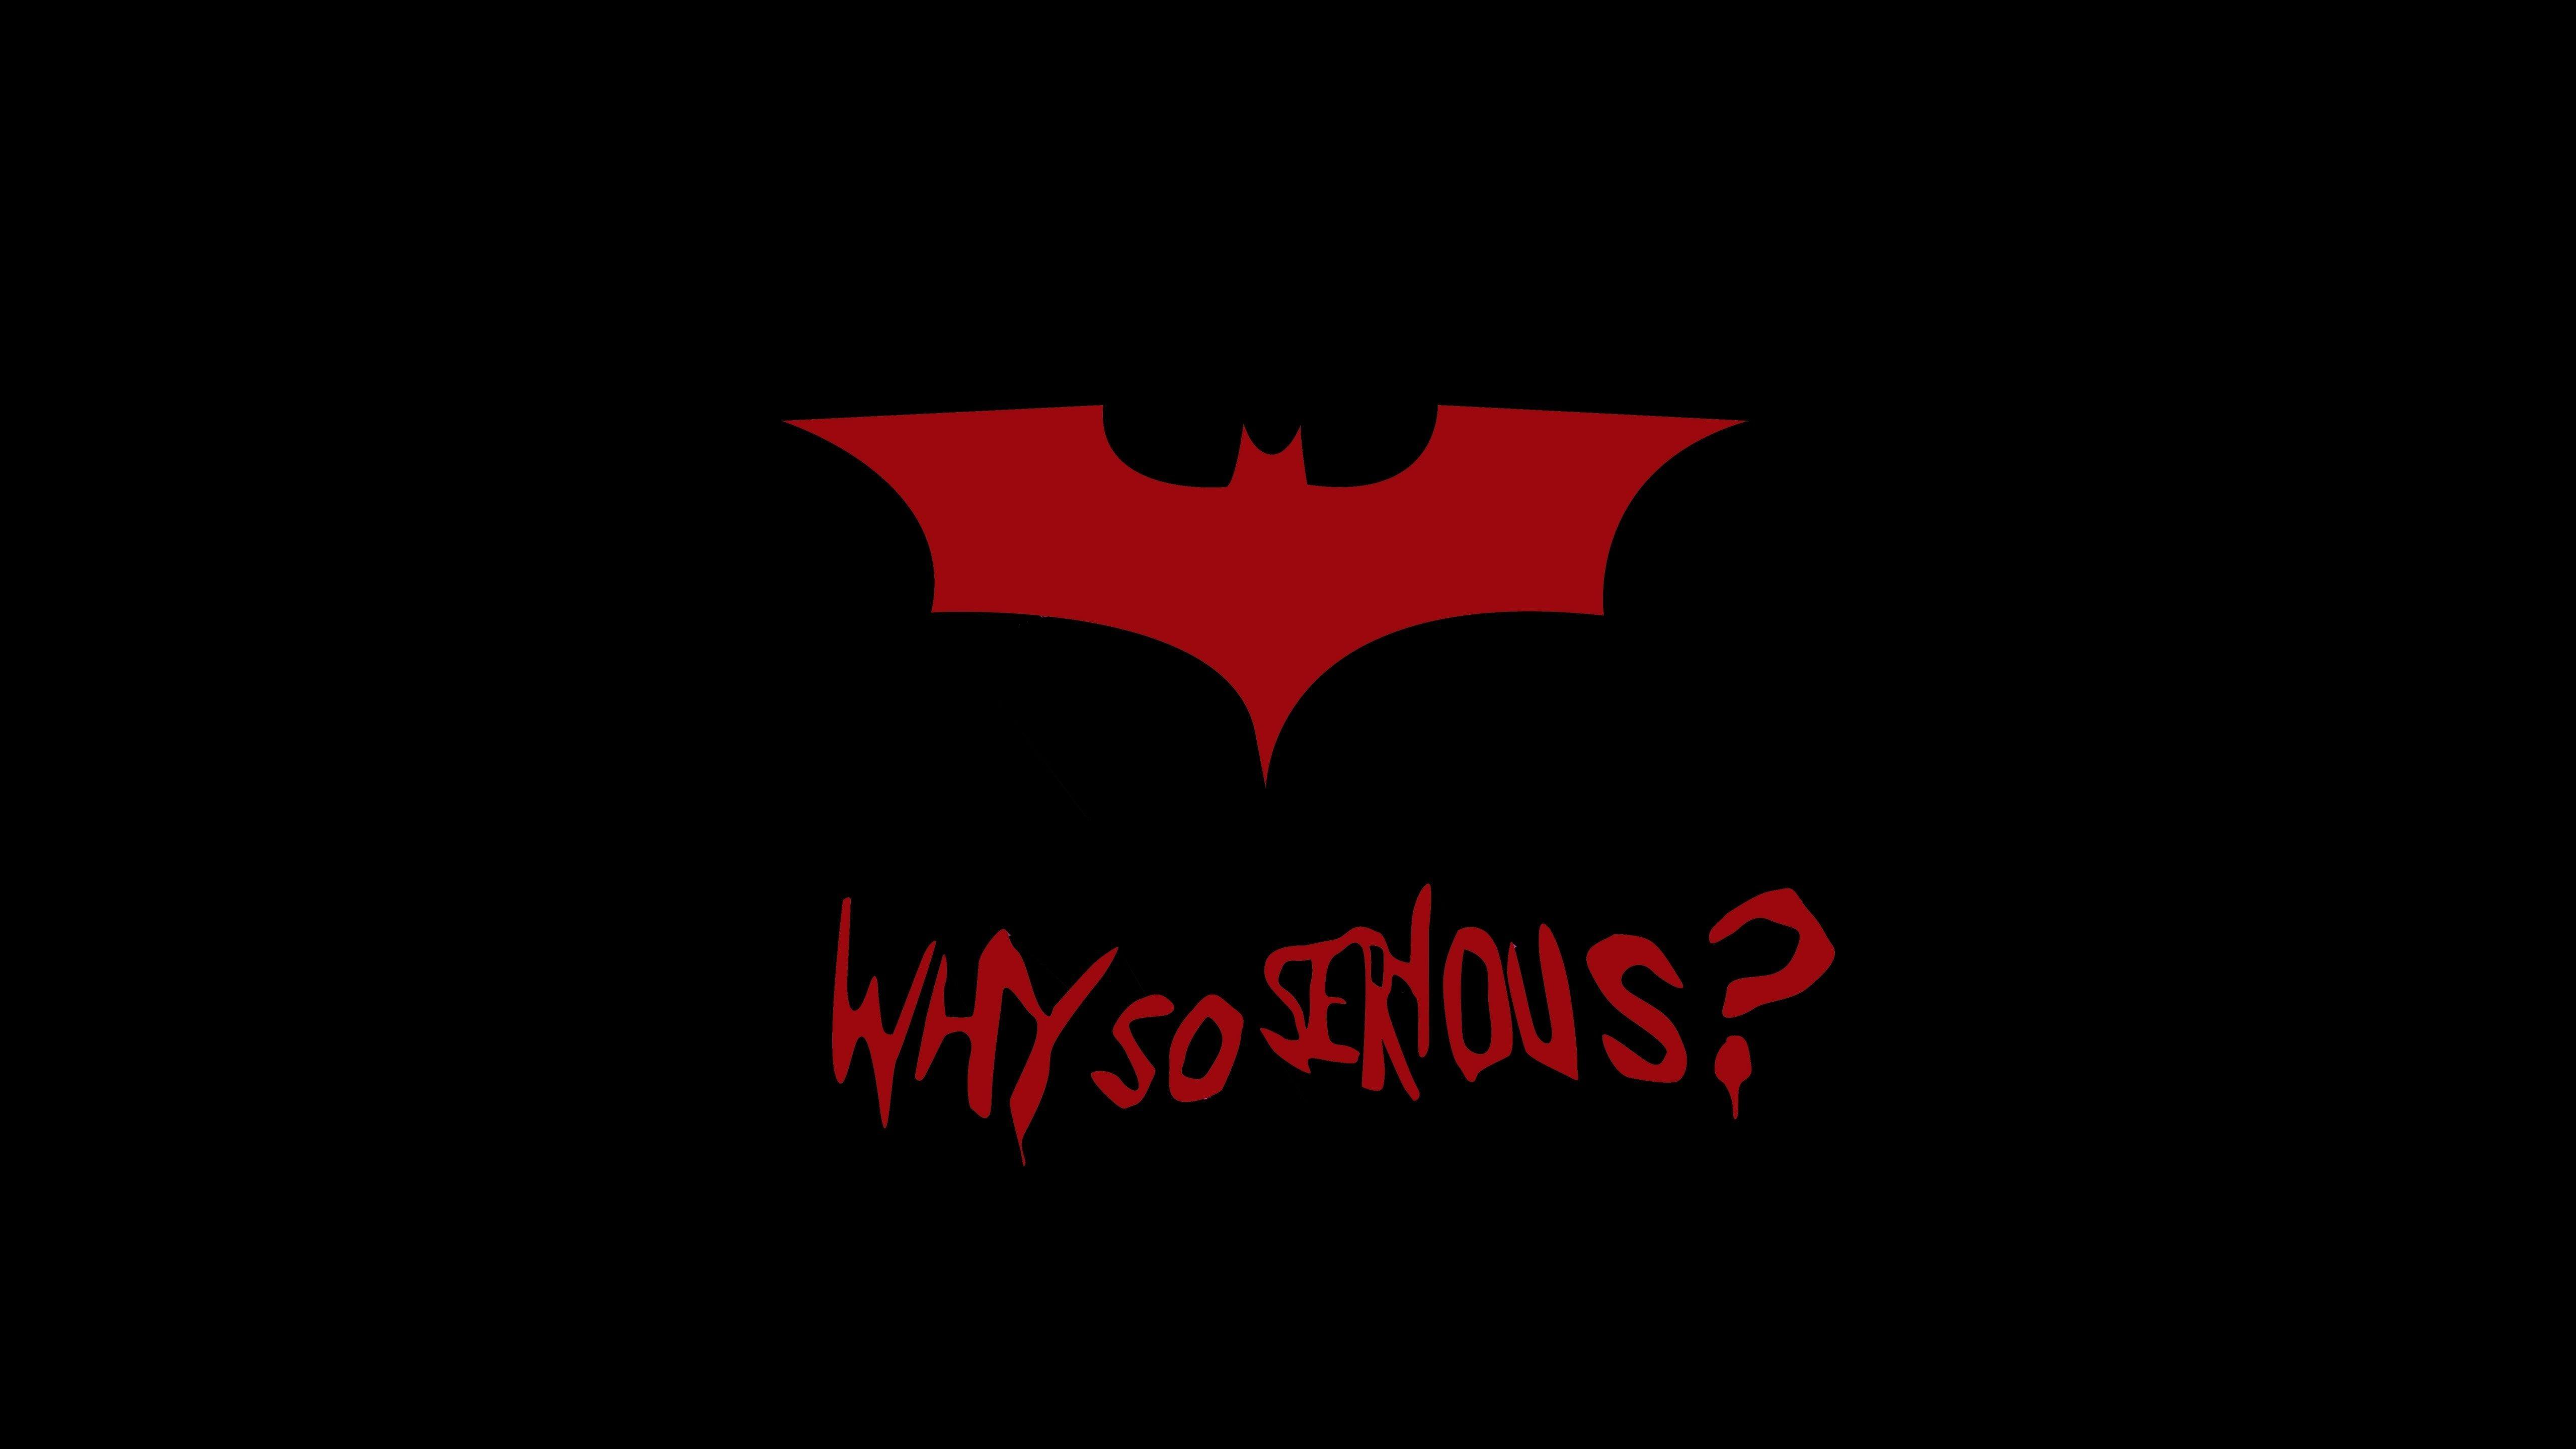 Why So Serious 4k Wallpaper Joker Hd Wallpaper Batman Wallpaper Joker Wallpapers